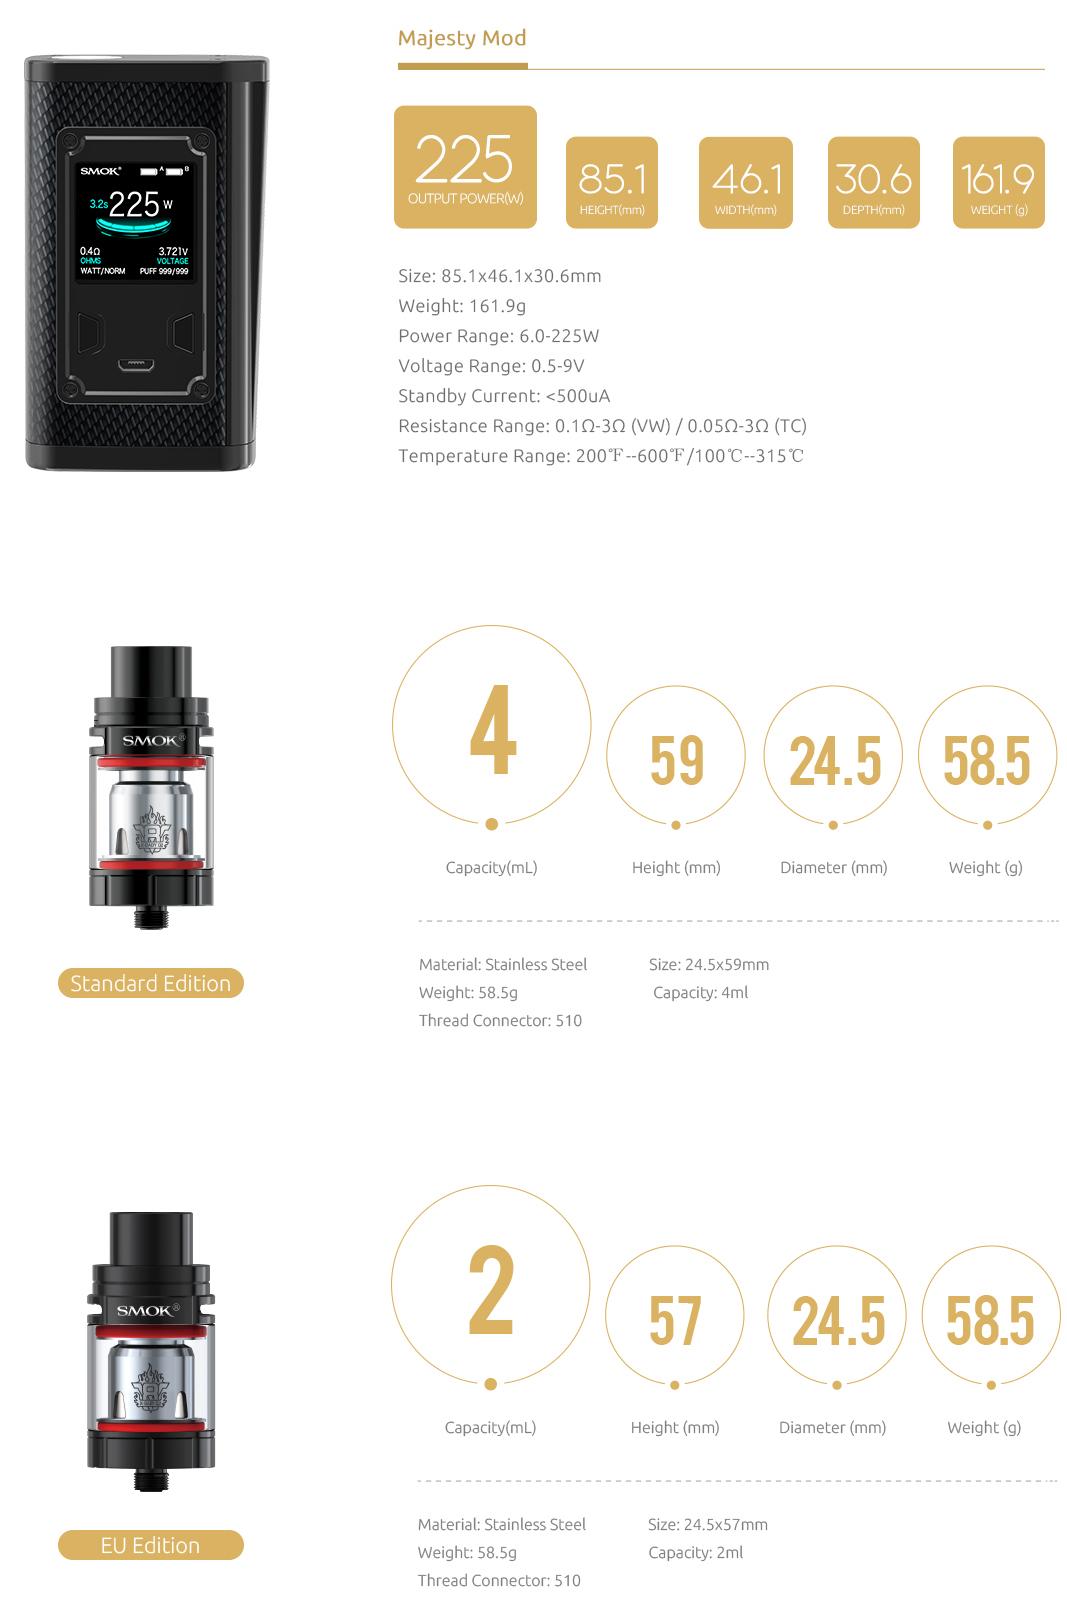 Smok Majesty e-sigarett spesifikasjoner